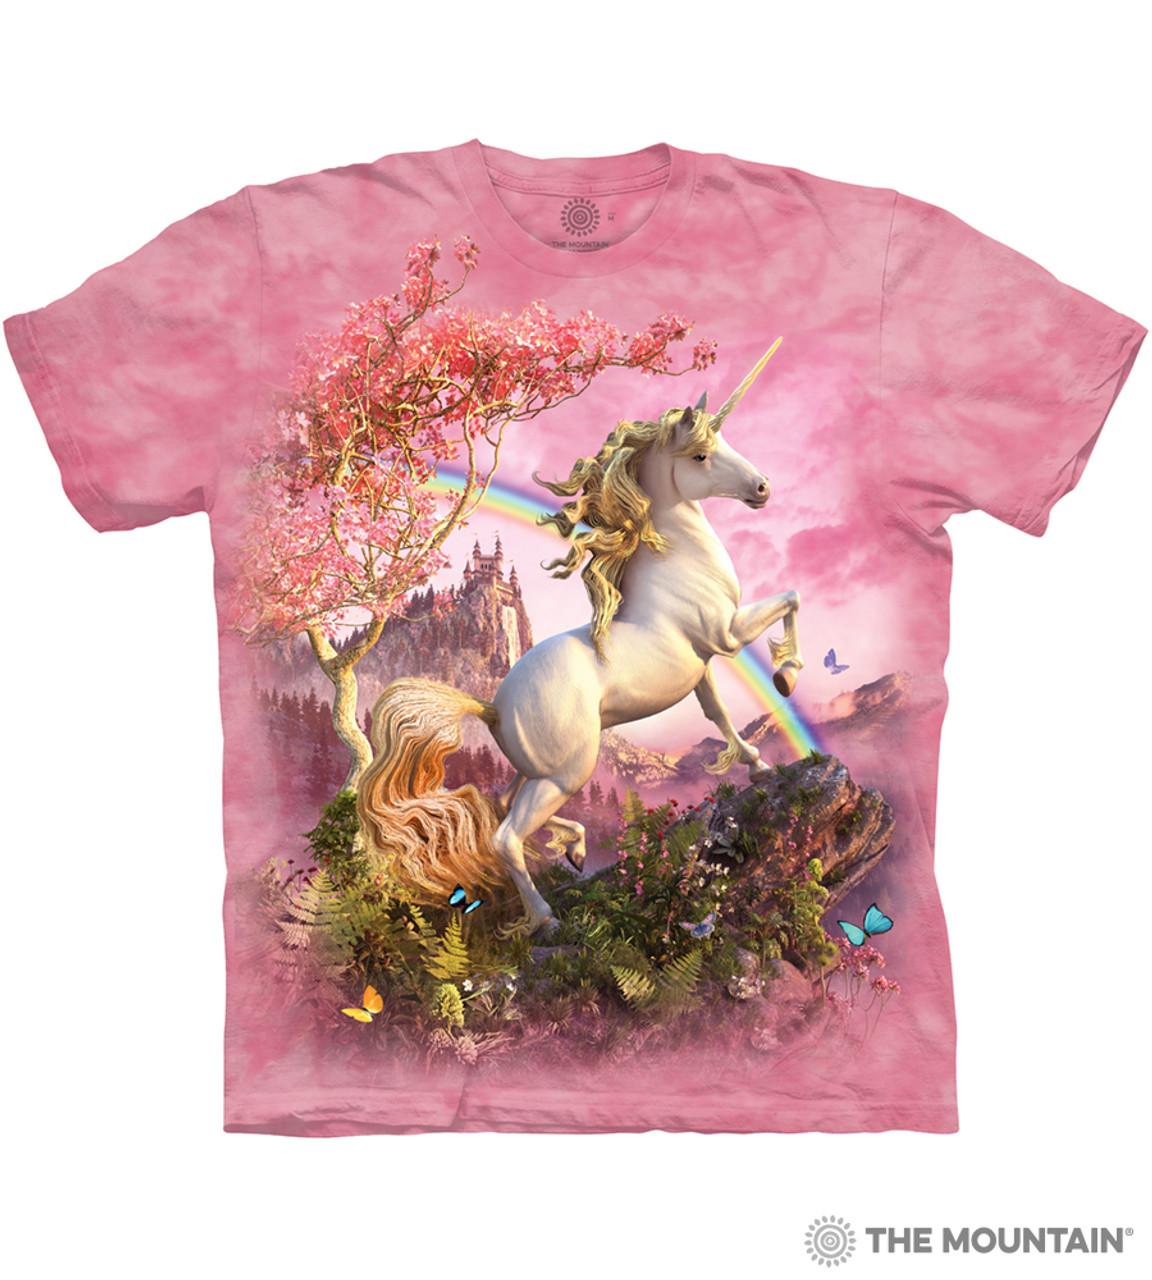 f46d0e2a6543 The Mountain Adult Unisex T-Shirt - Awesome Unicorn